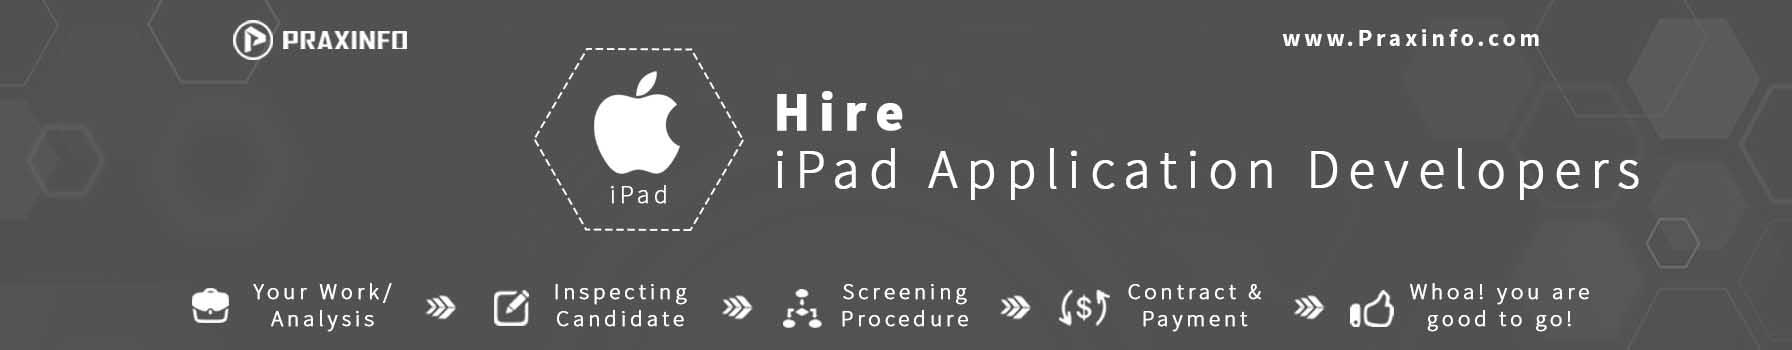 hire-iPad-Application-developer-banner-1.jpg